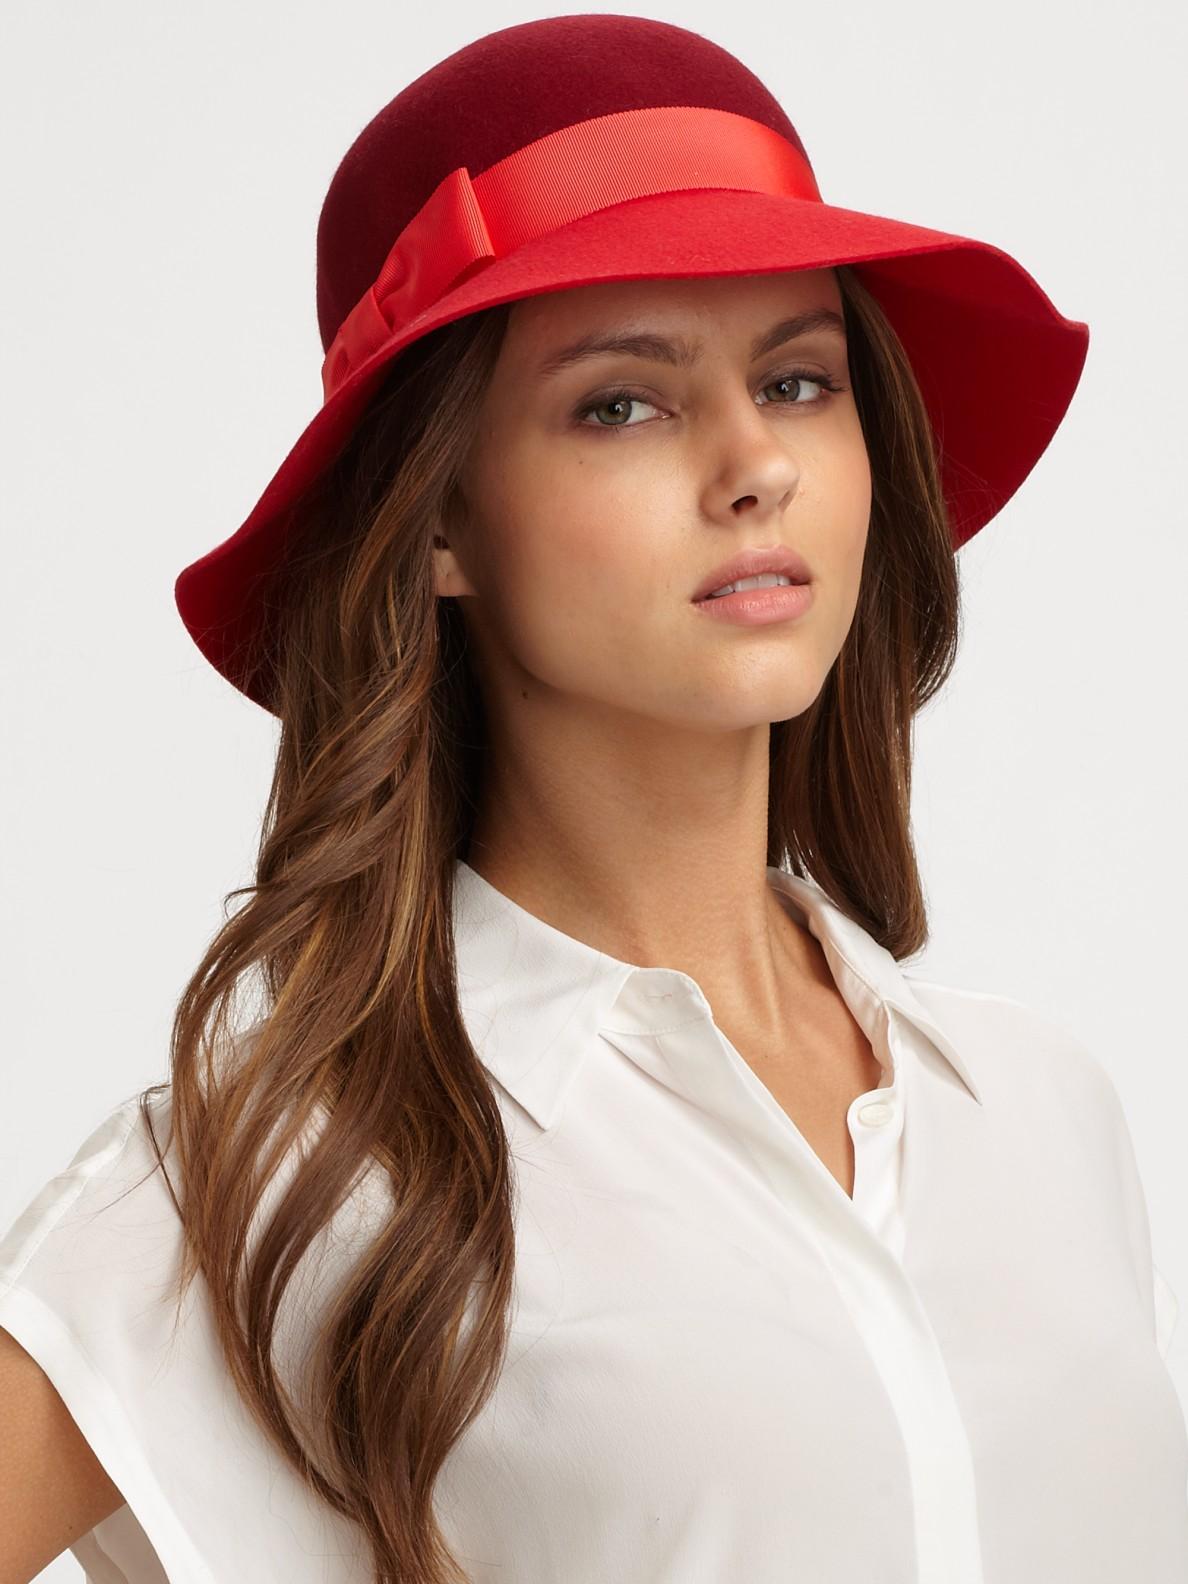 Lyst - Kate Spade New York Walker Park Wool Felt Hat in Red d0daacbb60c